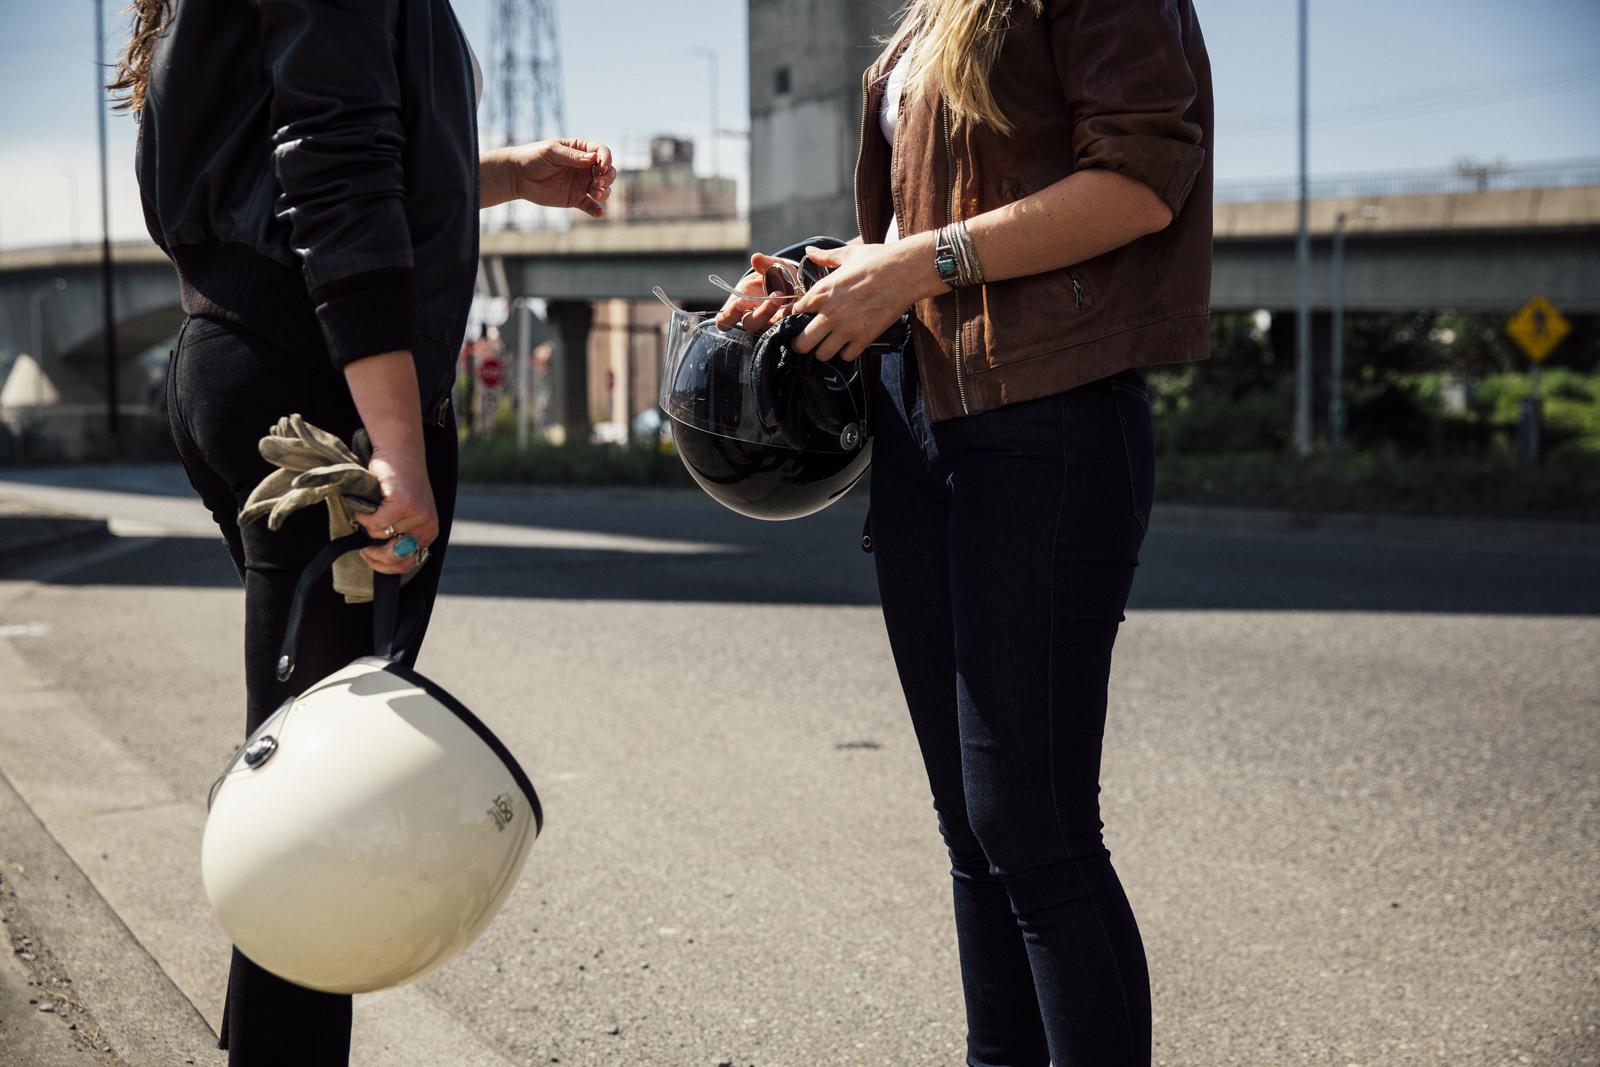 motogirls_2.jpg